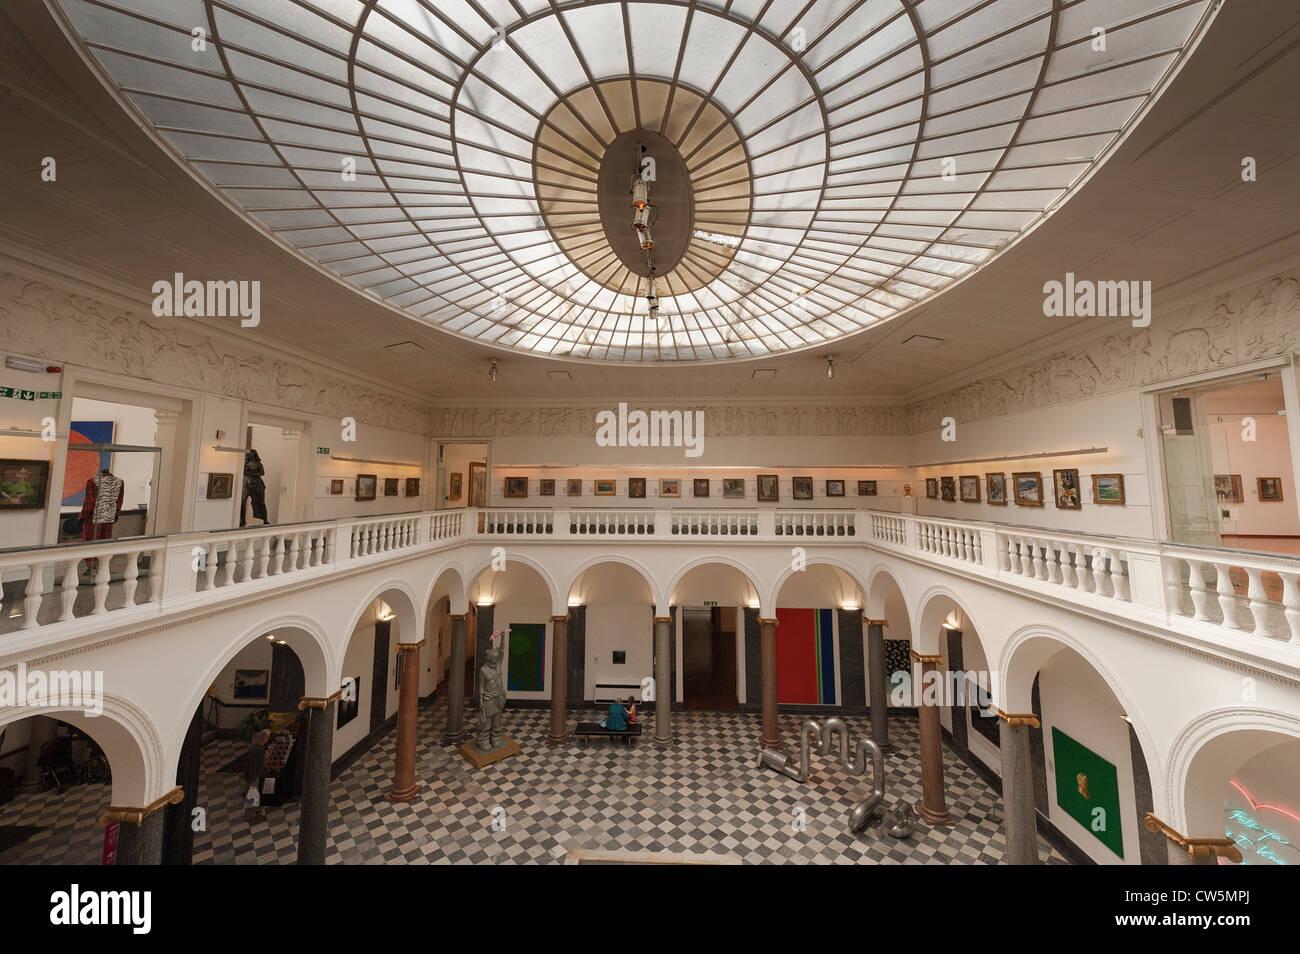 Art Gallery, Aberdeen - Stock Image